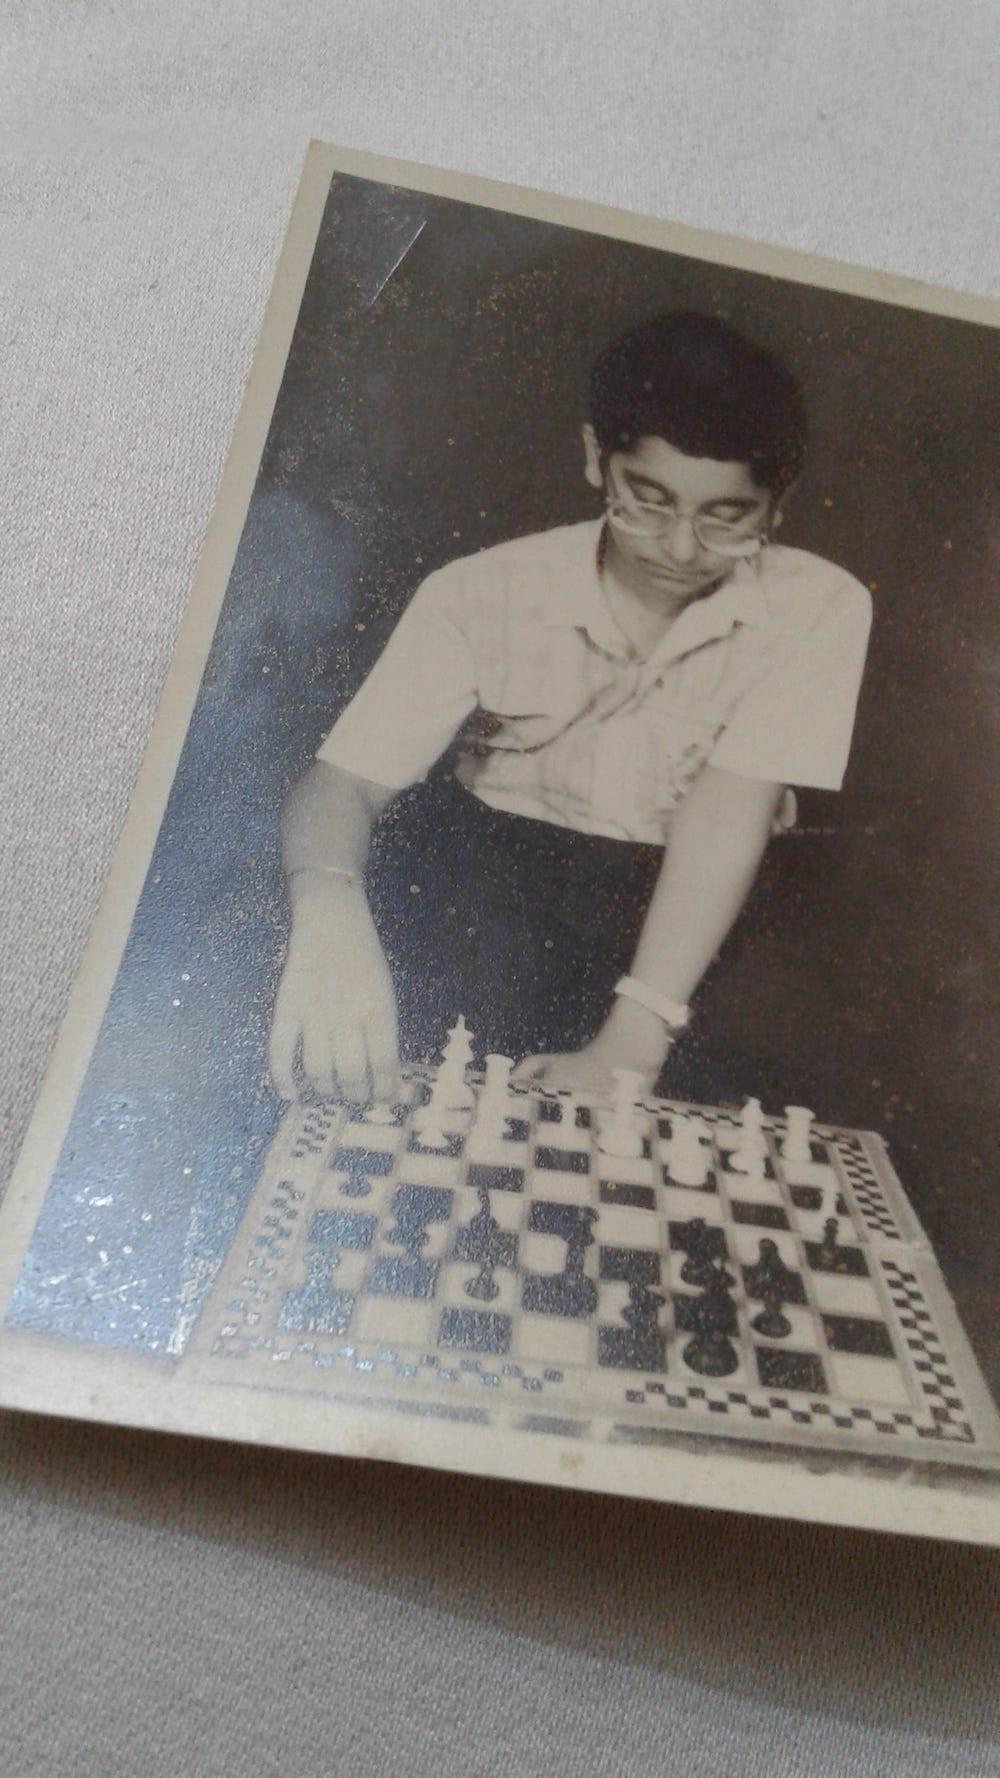 Poojan Kumar kid chess